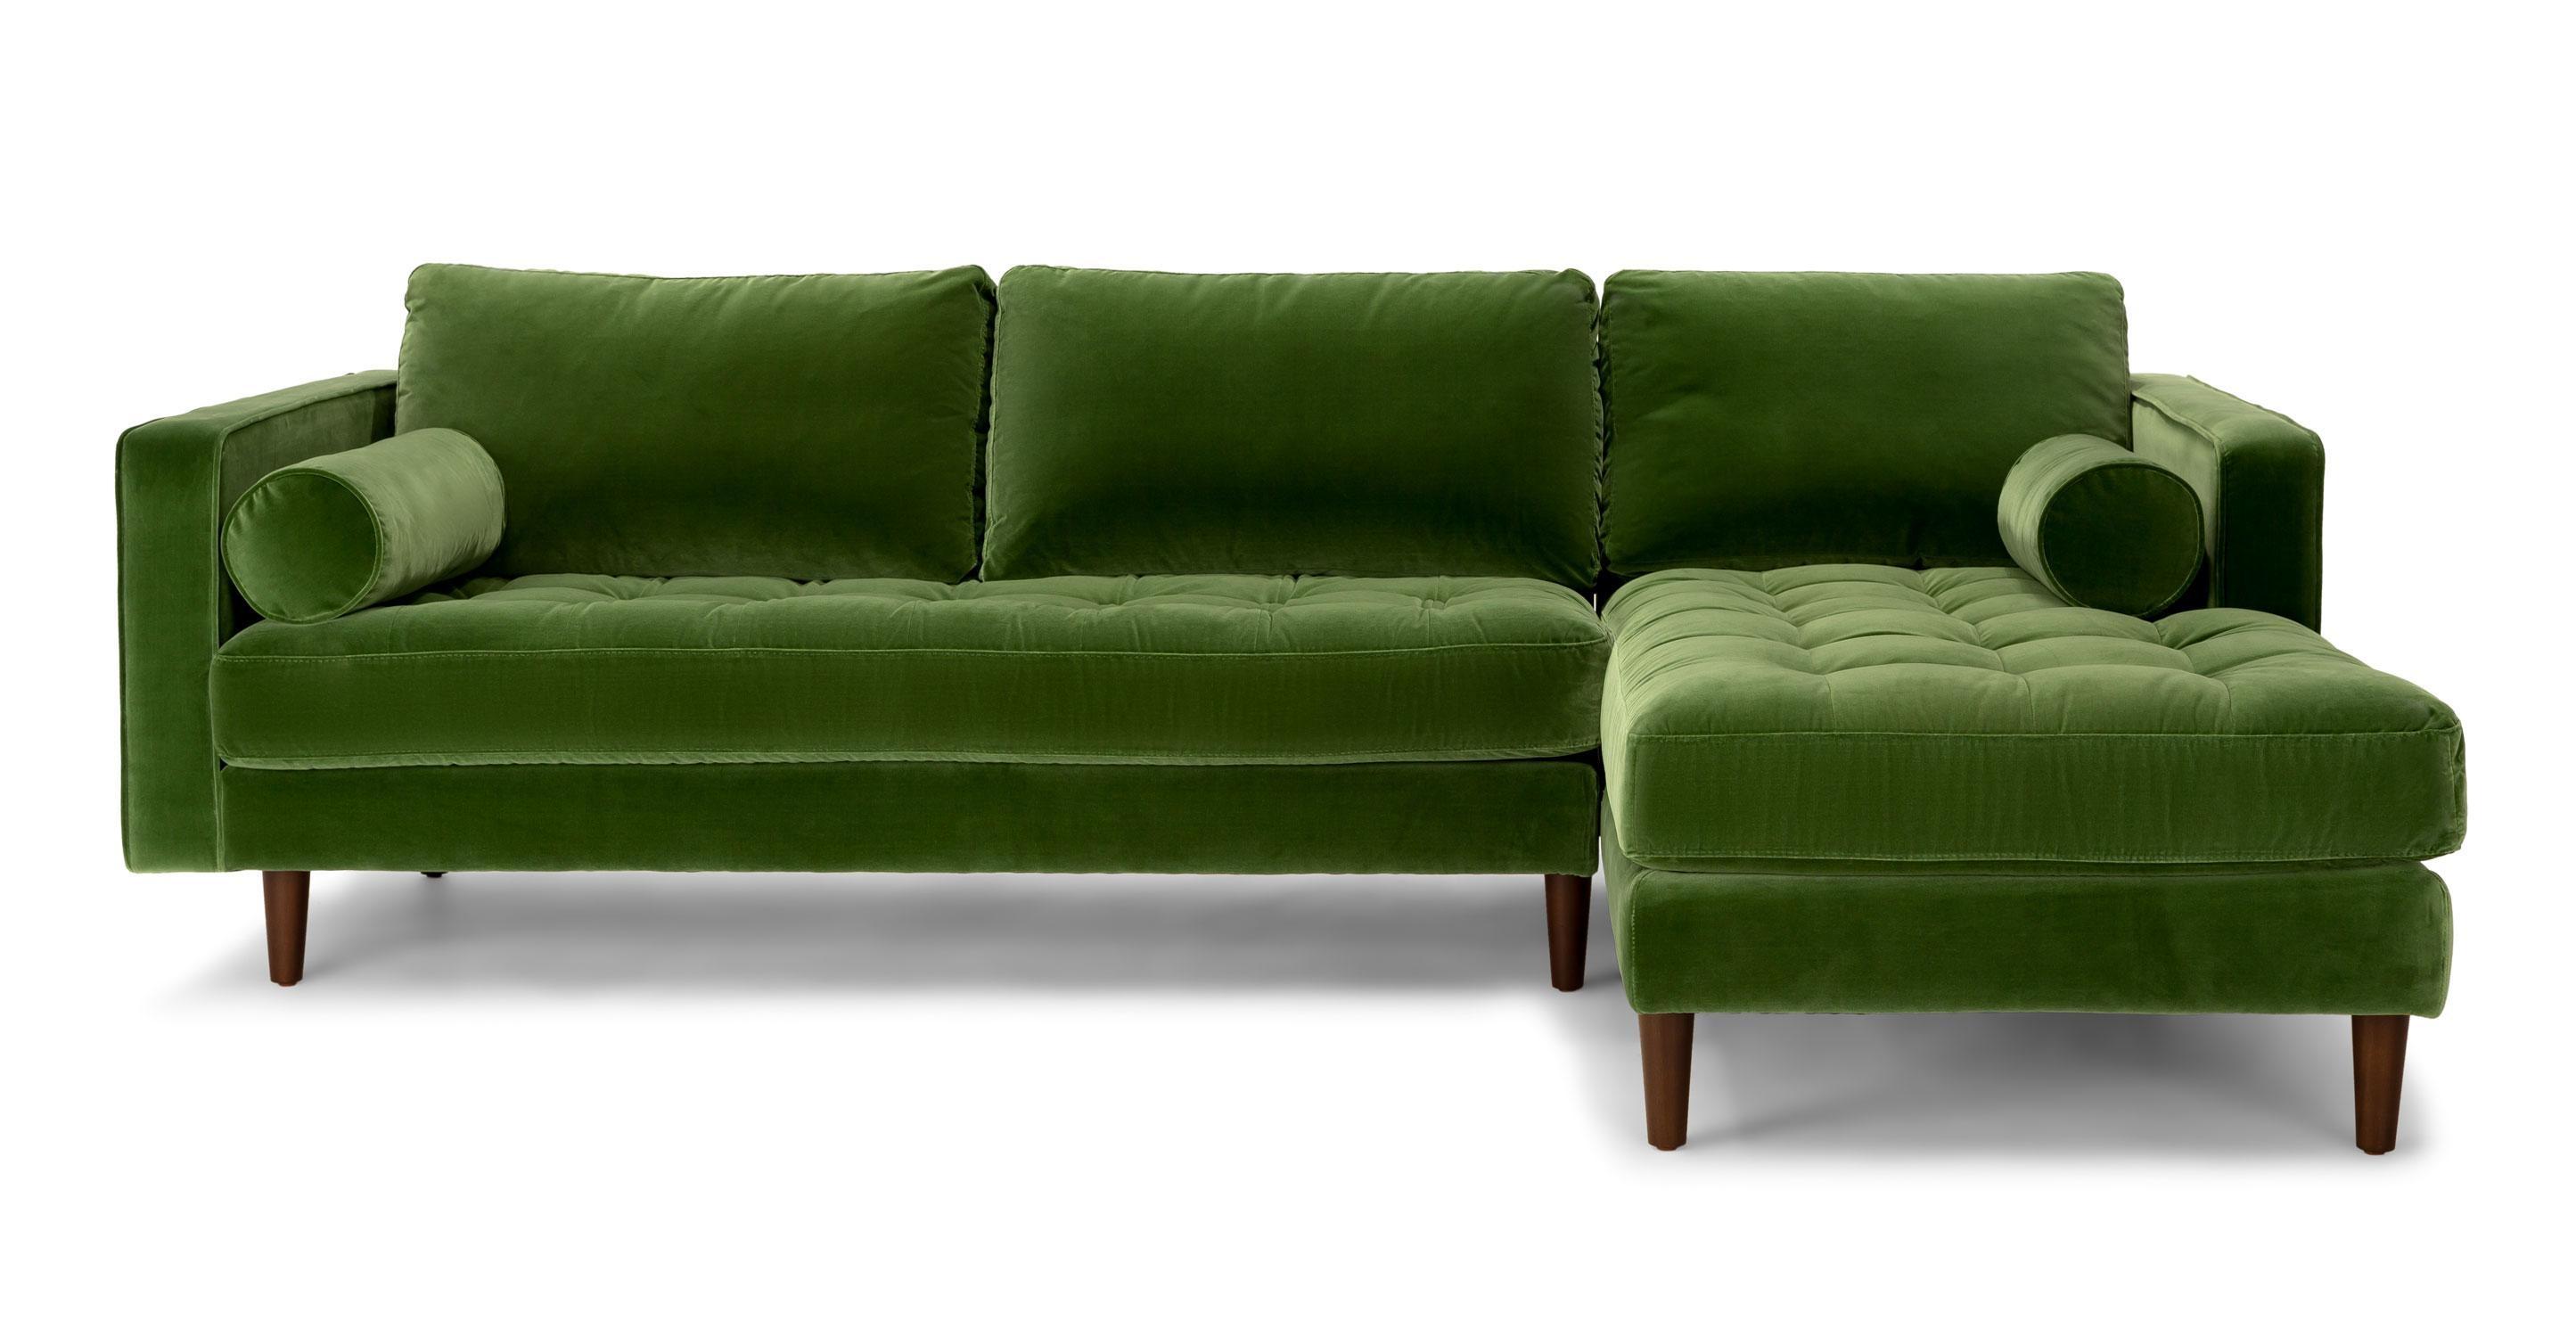 Velvet Sectional Sofa | Demand Sofas Set With Regard To Velvet Sofas Sectionals (View 3 of 20)